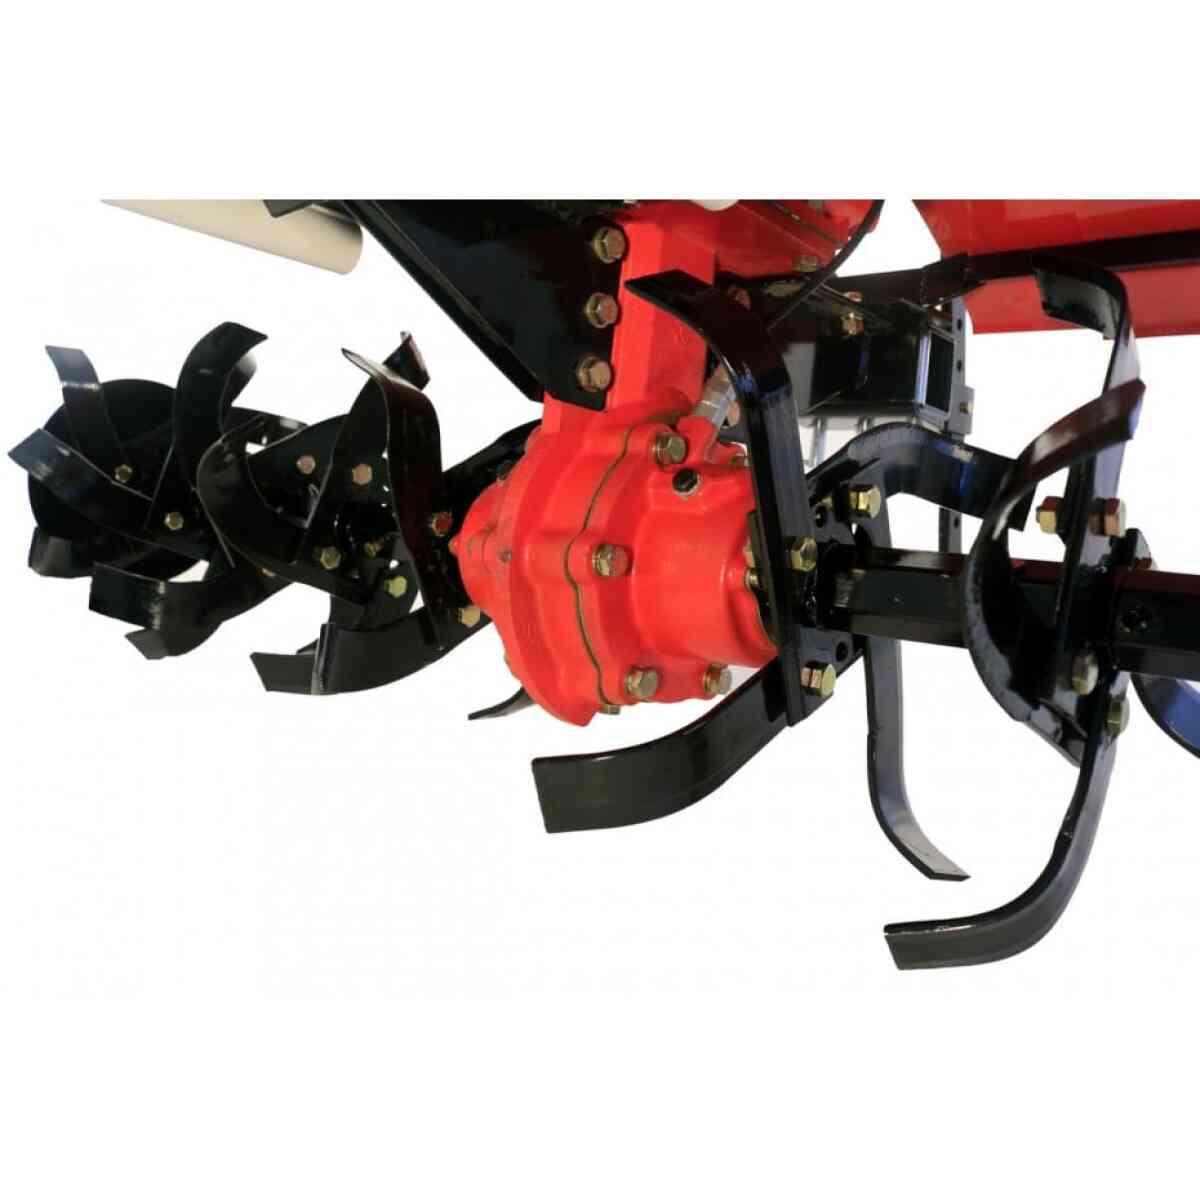 motocultor pro series new 1350 s o mac.ro 3 1 40